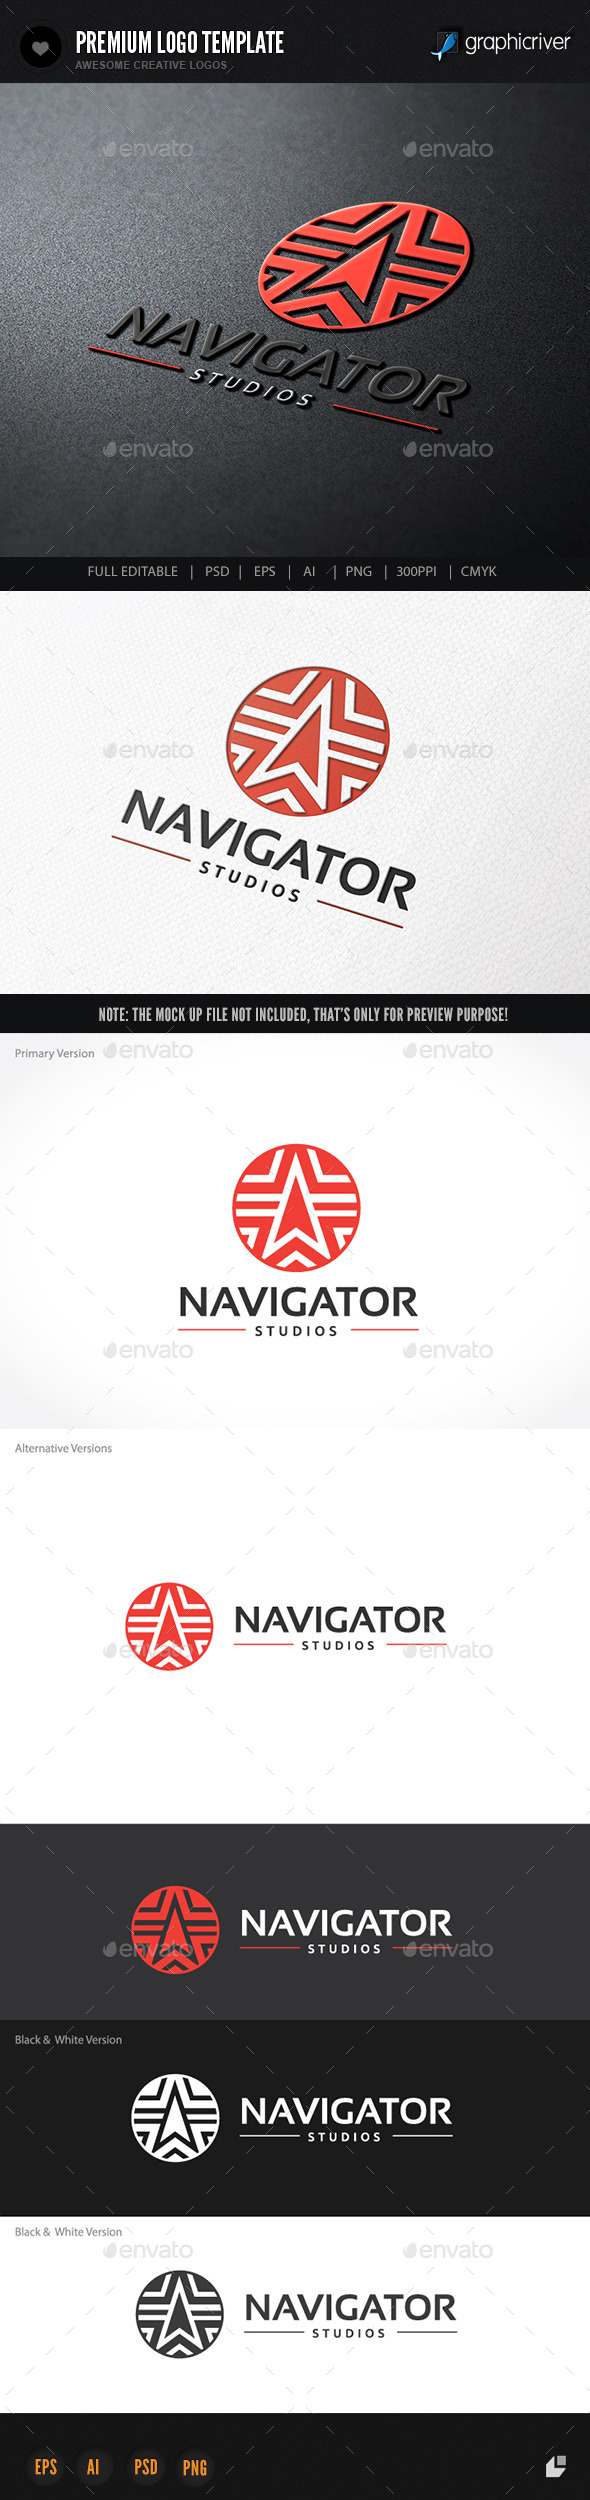 Navigation Studios